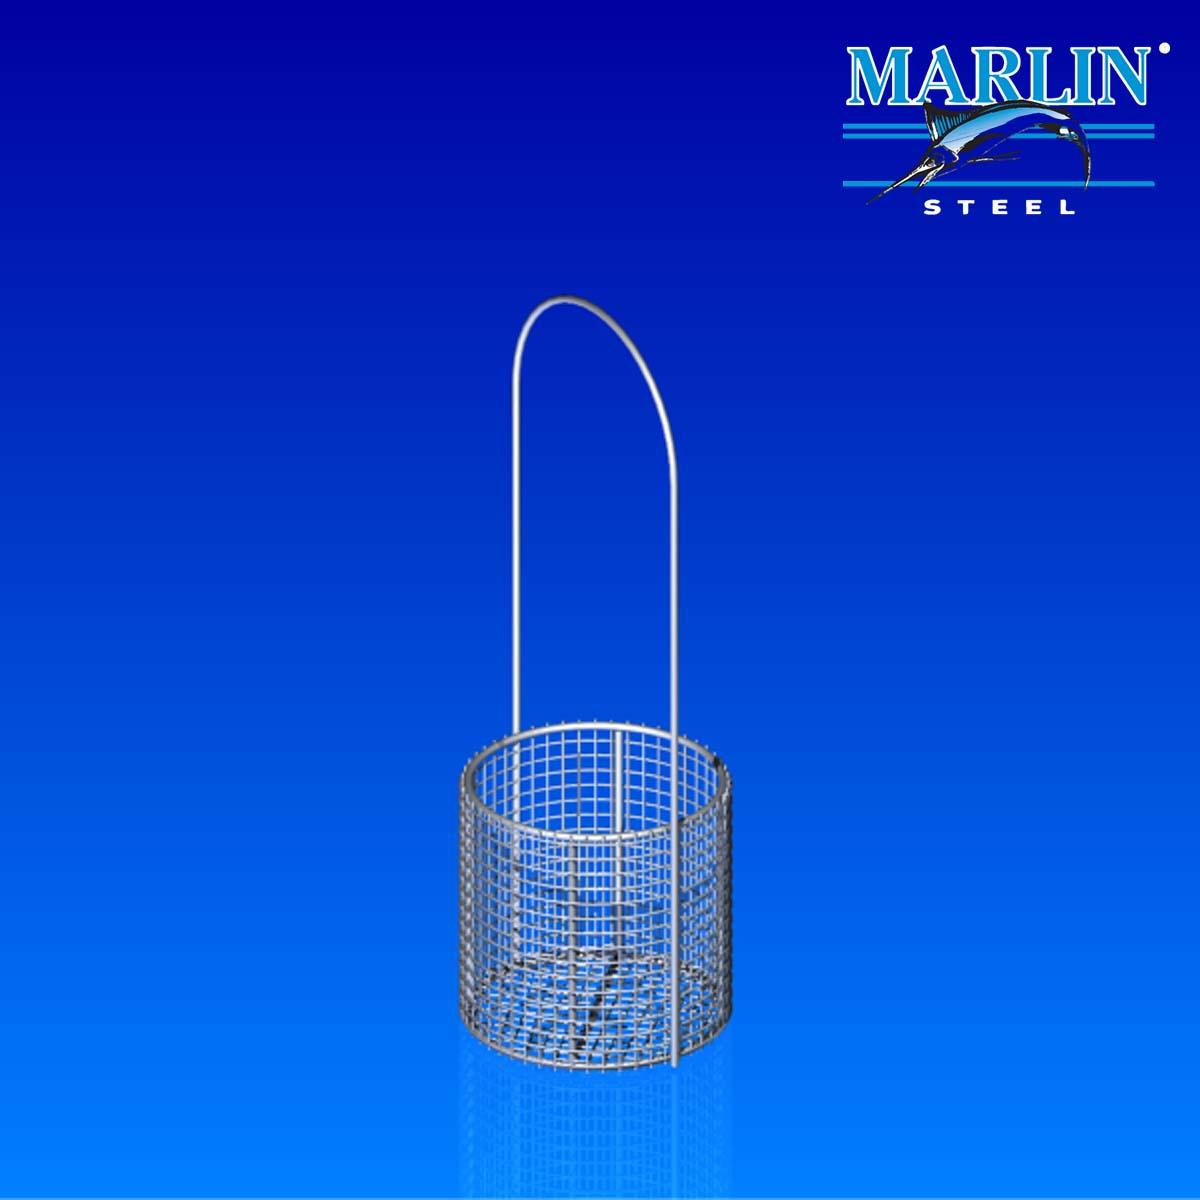 Marlin Steel Round Basket with Handles 853002